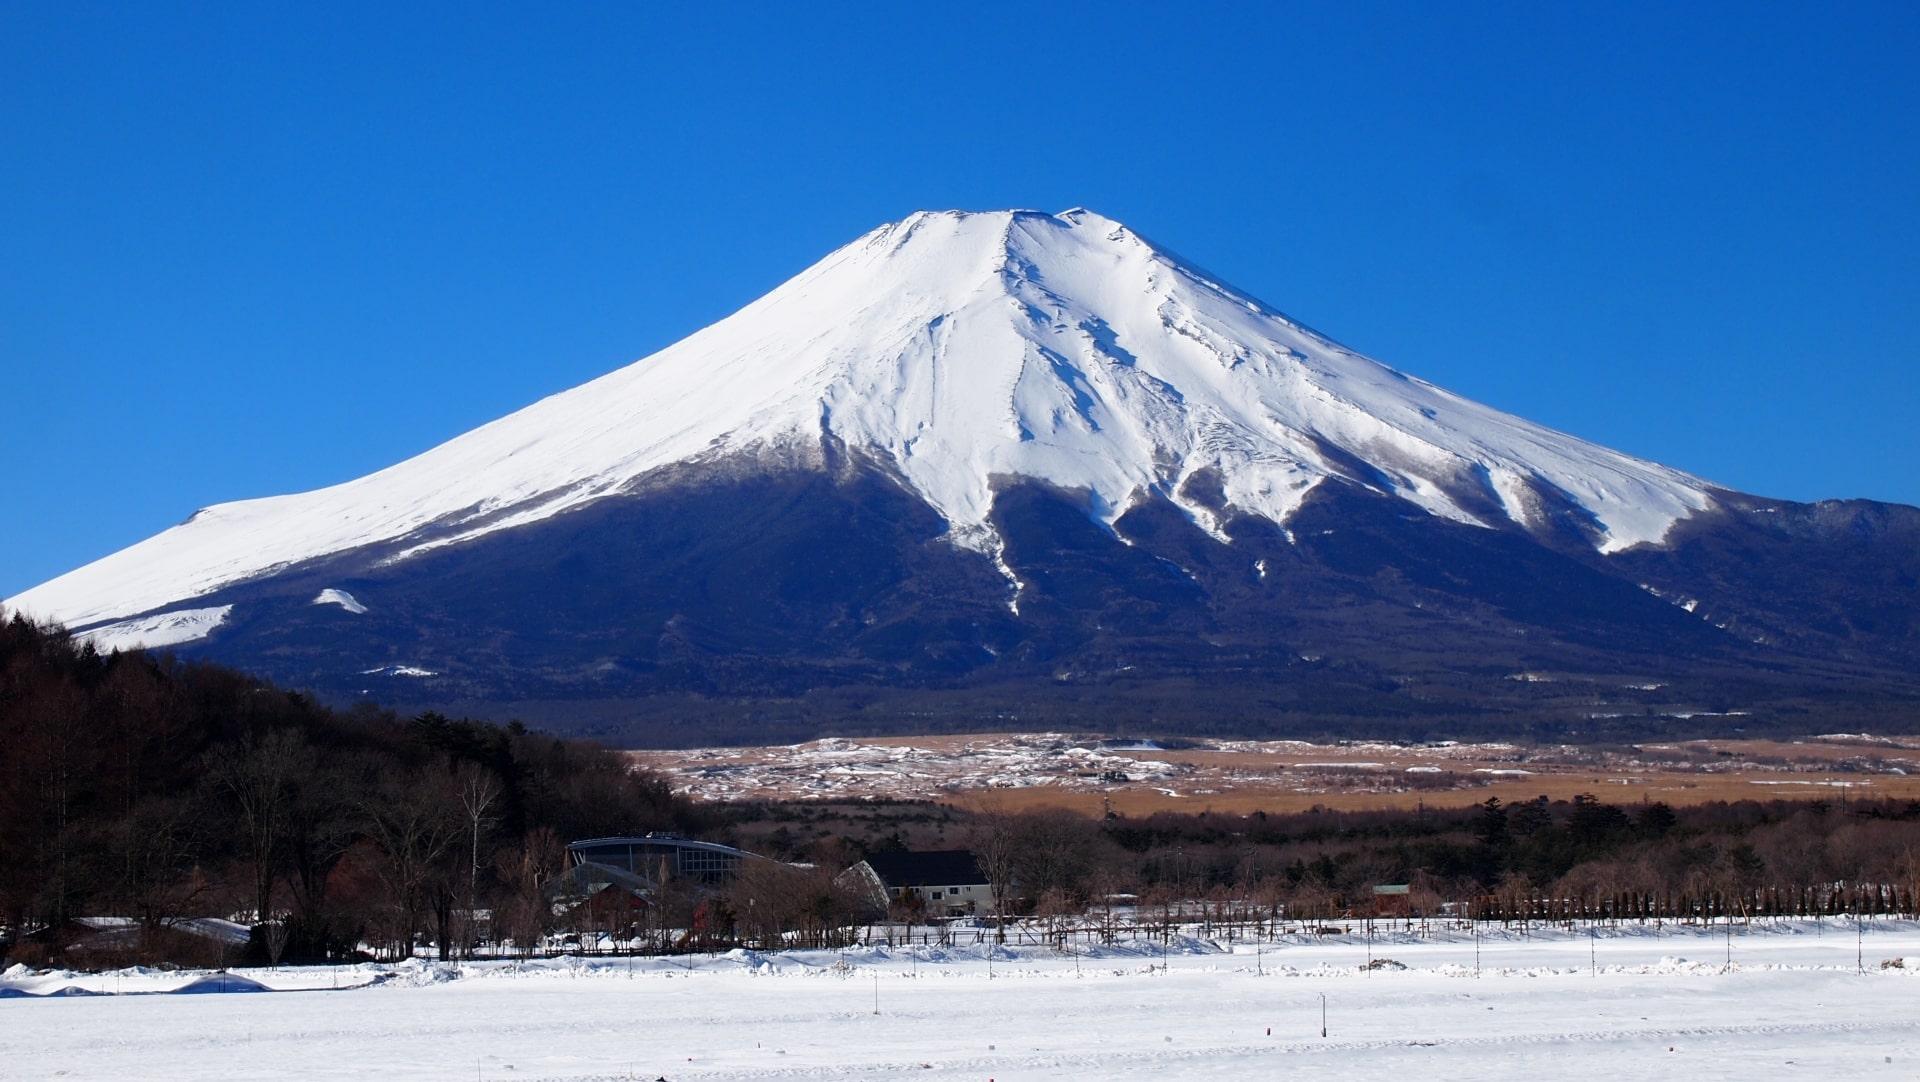 Mt.Fuji in winter